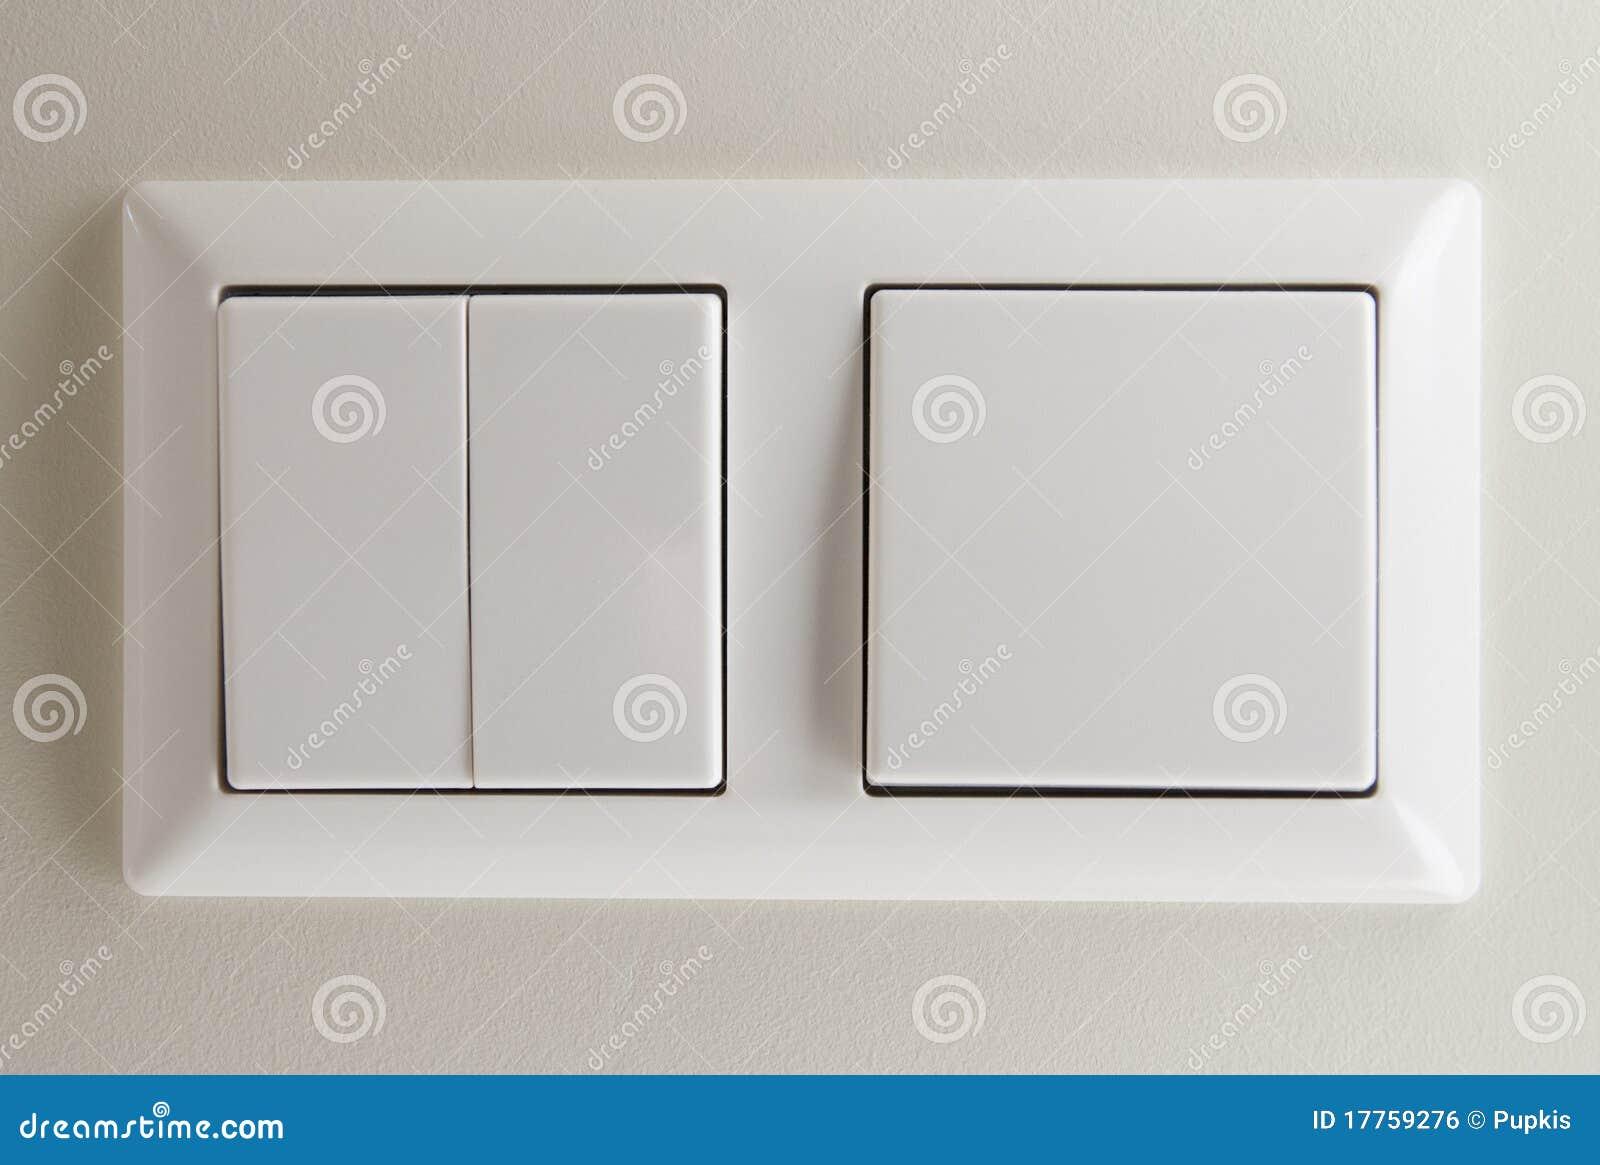 Nett Zwei Schalter Ideen - Elektrische Schaltplan-Ideen ...